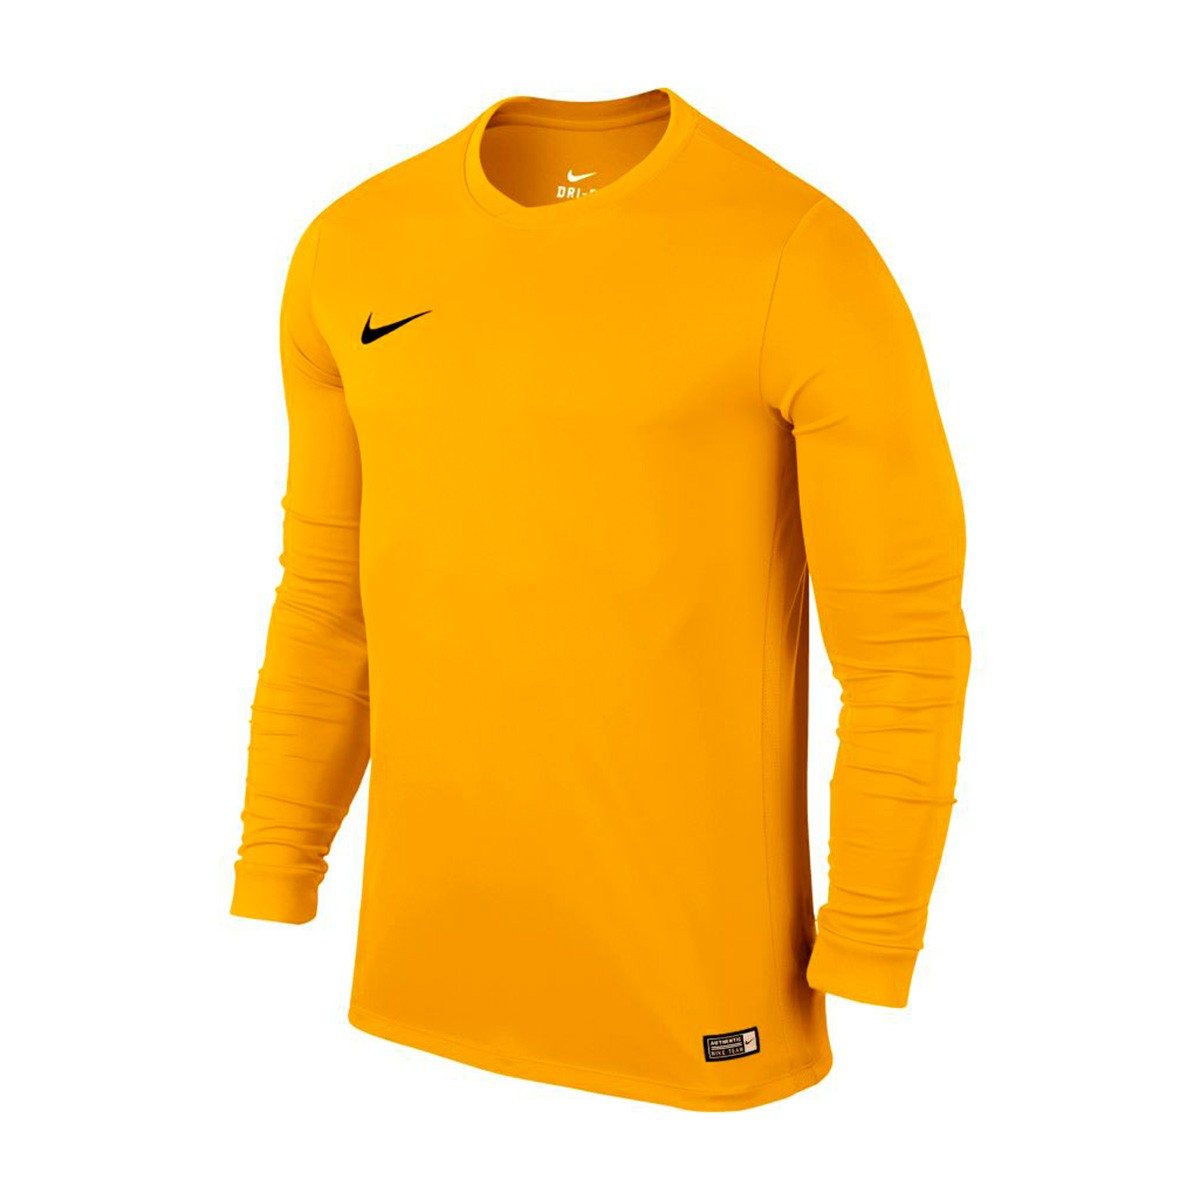 nuevo alto entrega gratis mejor selección de 2019 Jersey Nike Kids Park VI m/l University gold-Black - Football ...